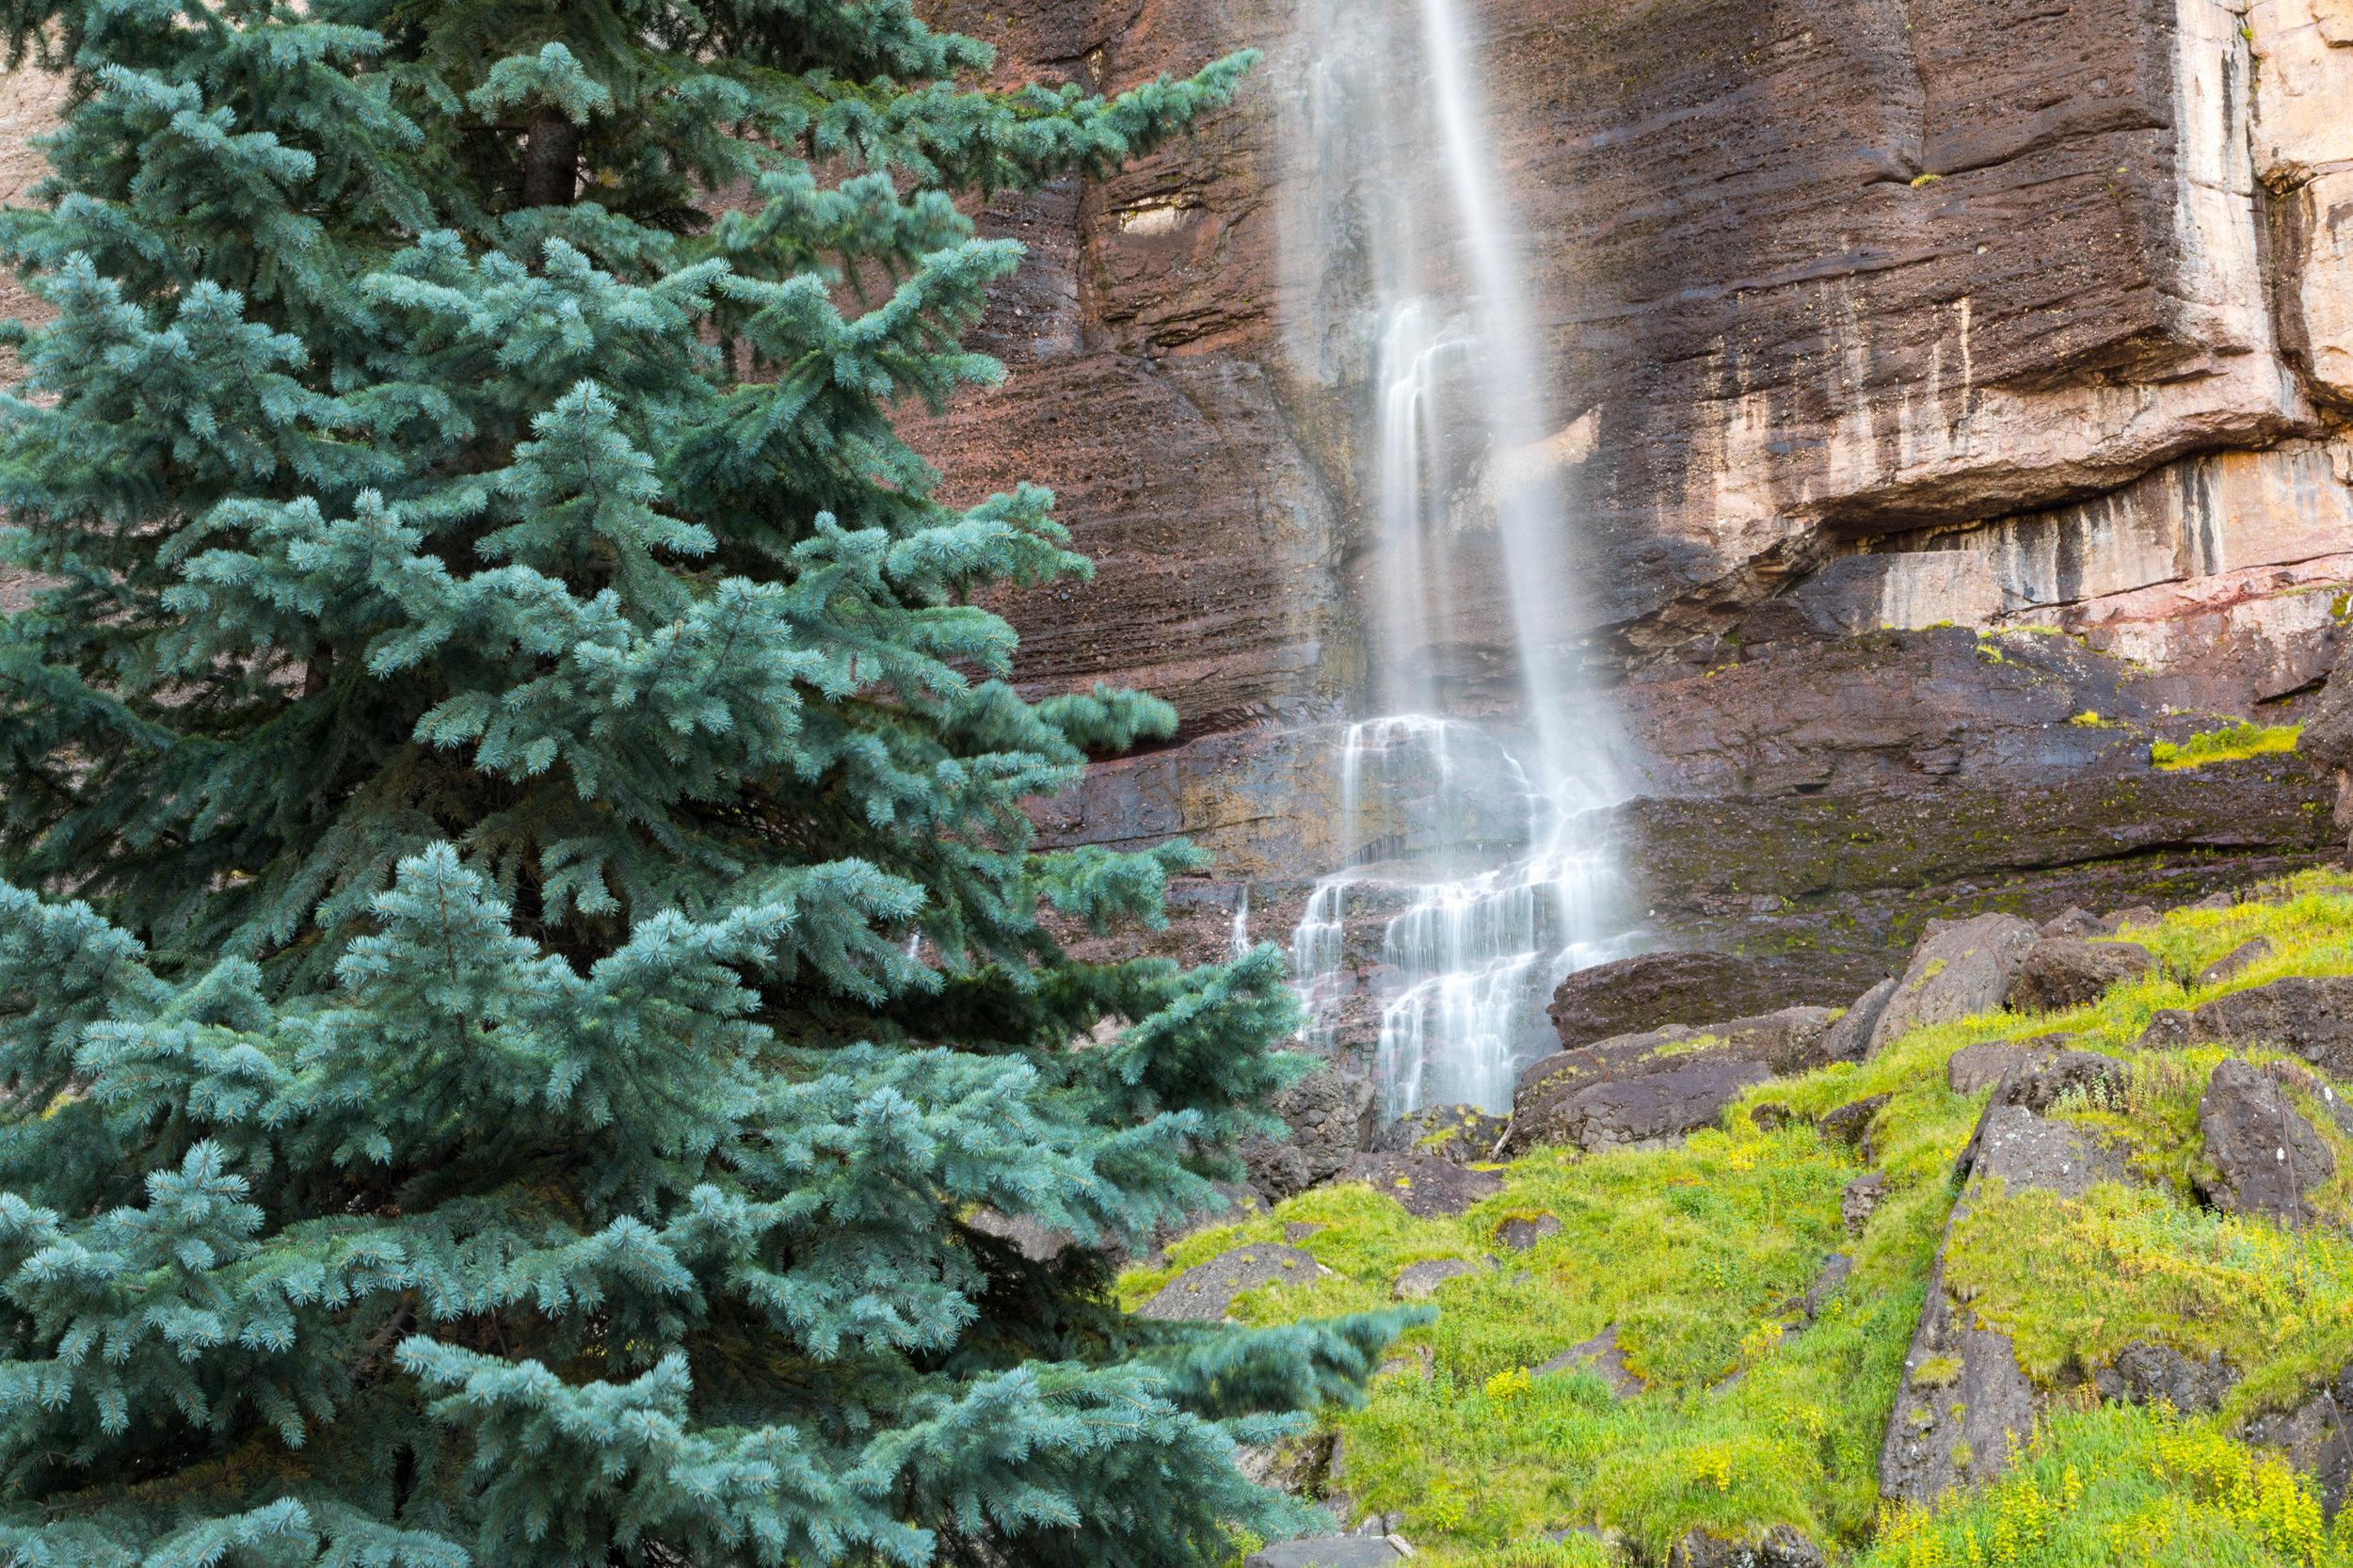 Bridal Veil Falls, Image # 3269